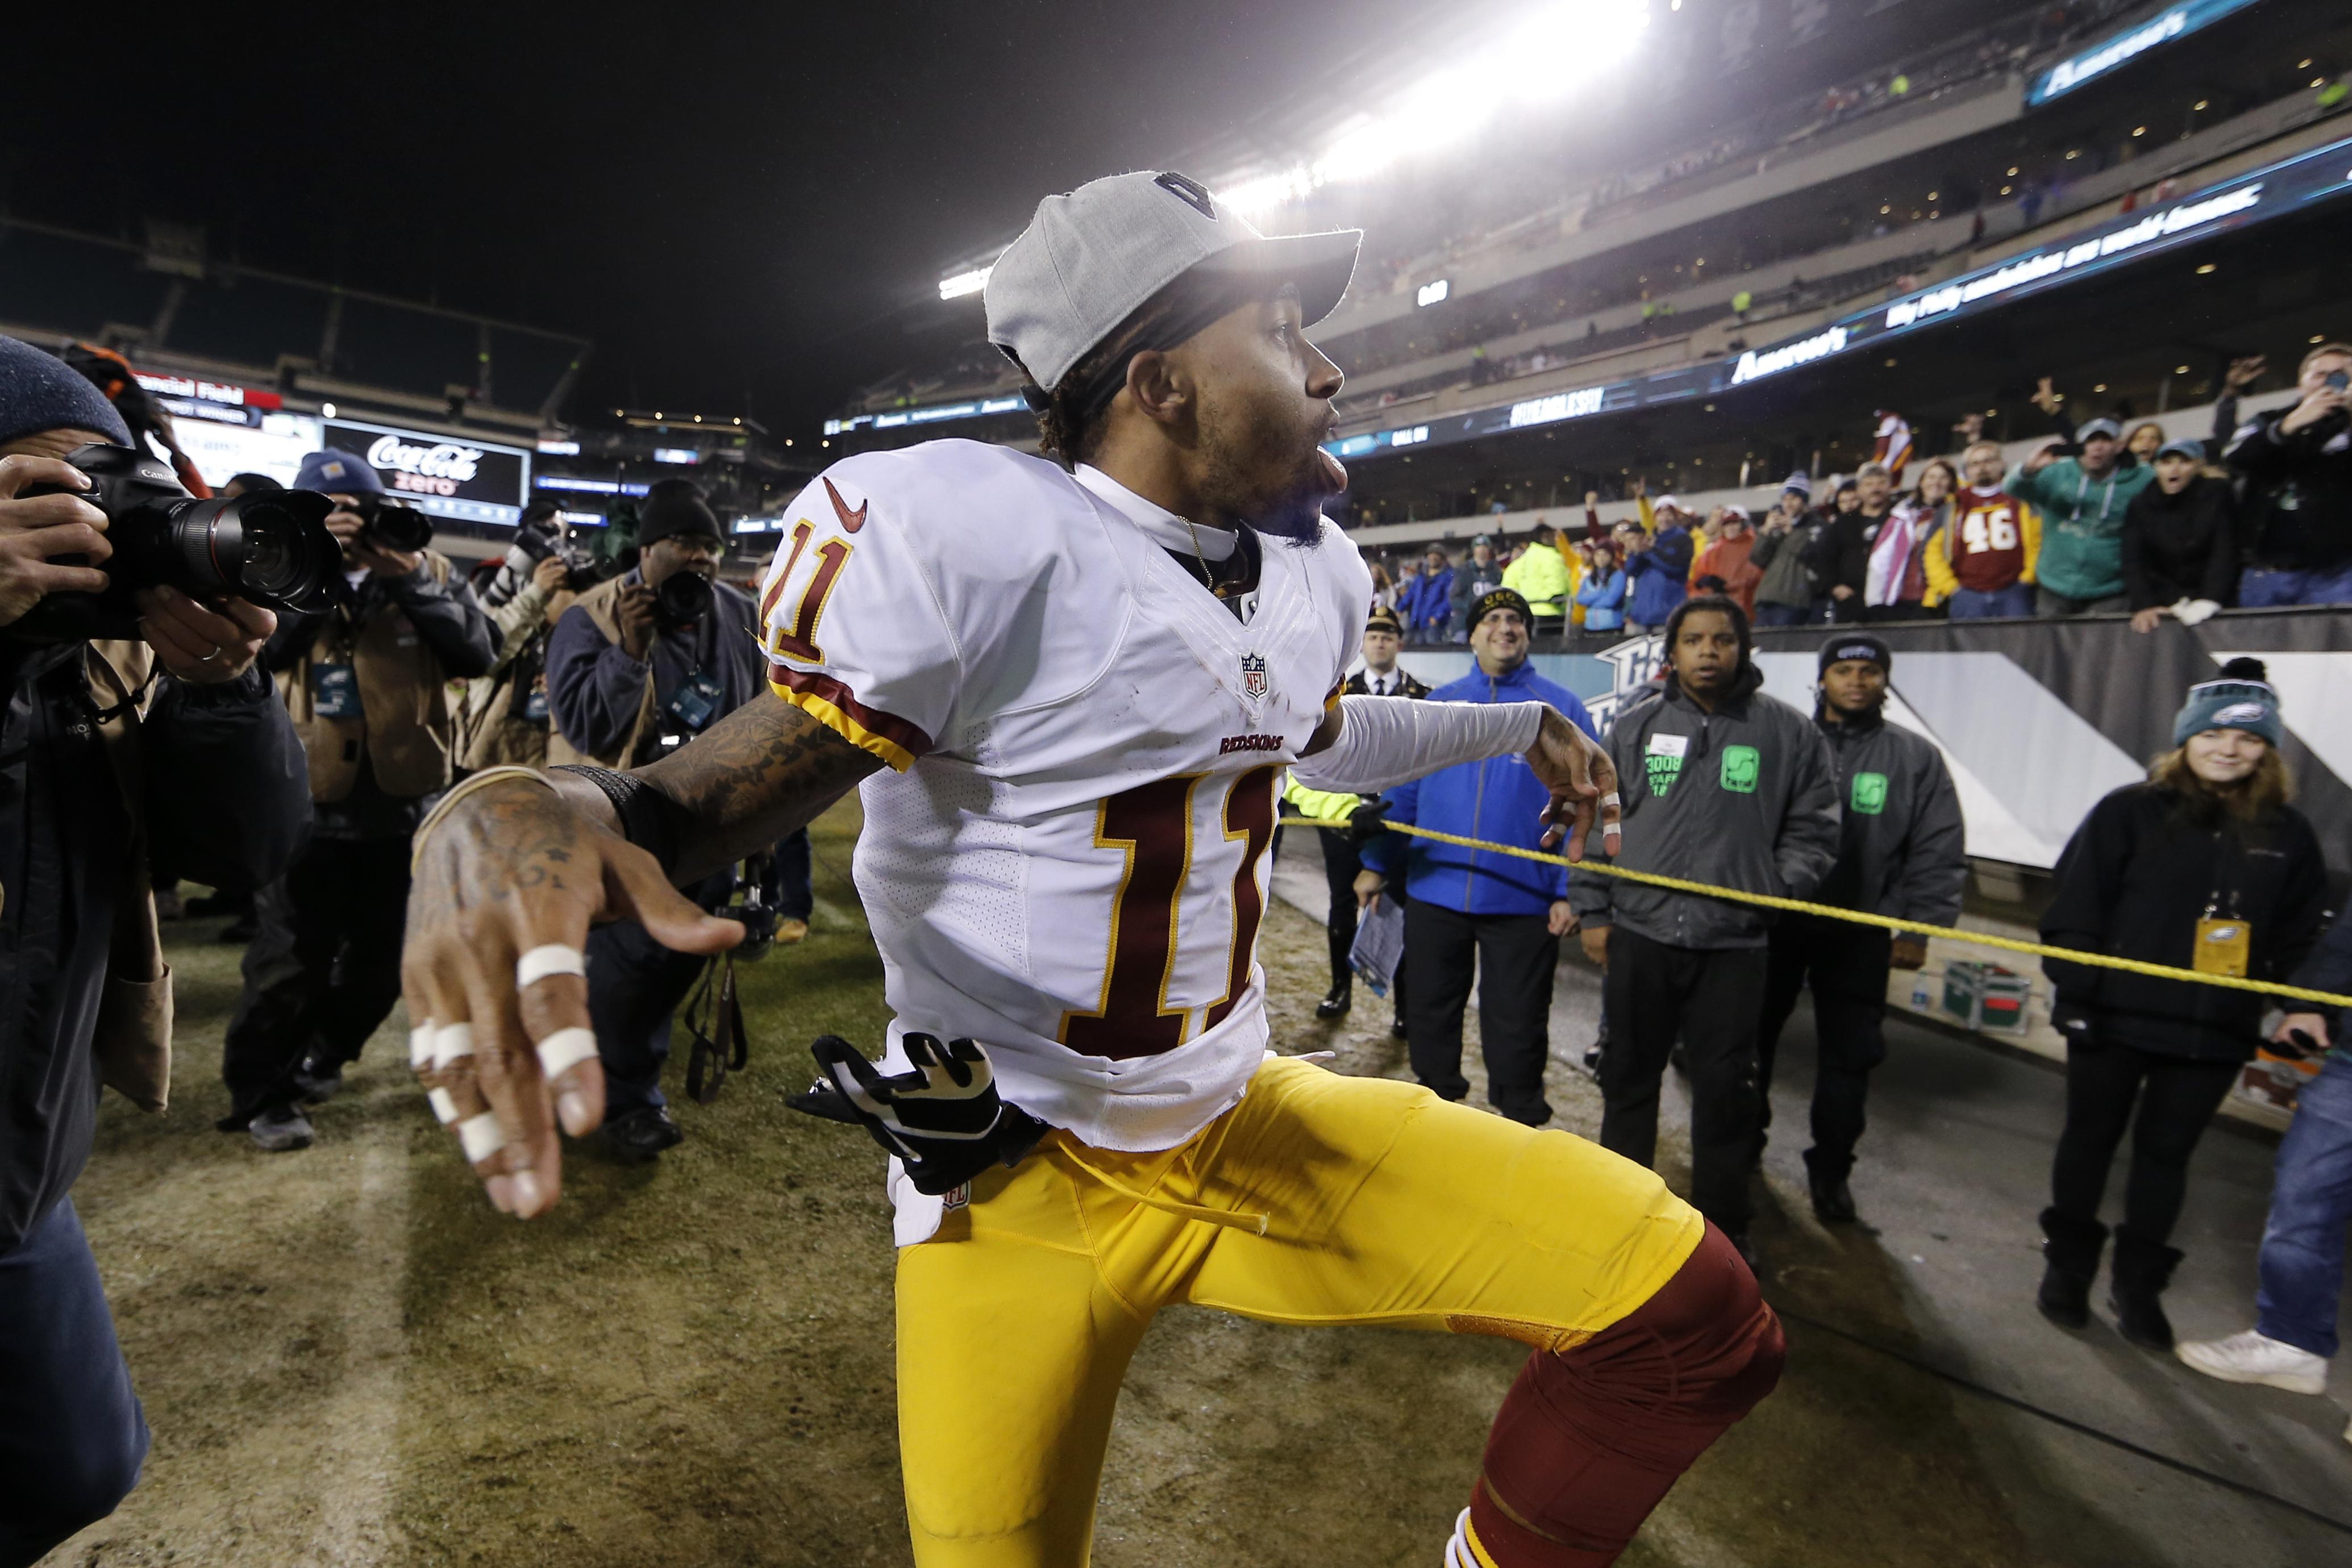 Washington Redskins' DeSean Jackson reacts as he walks off the field after an NFL football game against the Philadelphia Eagles, Saturday, Dec. 26, 2015, in Philadelphia. Washington won 38-24. (AP Photo/Matt Rourke)